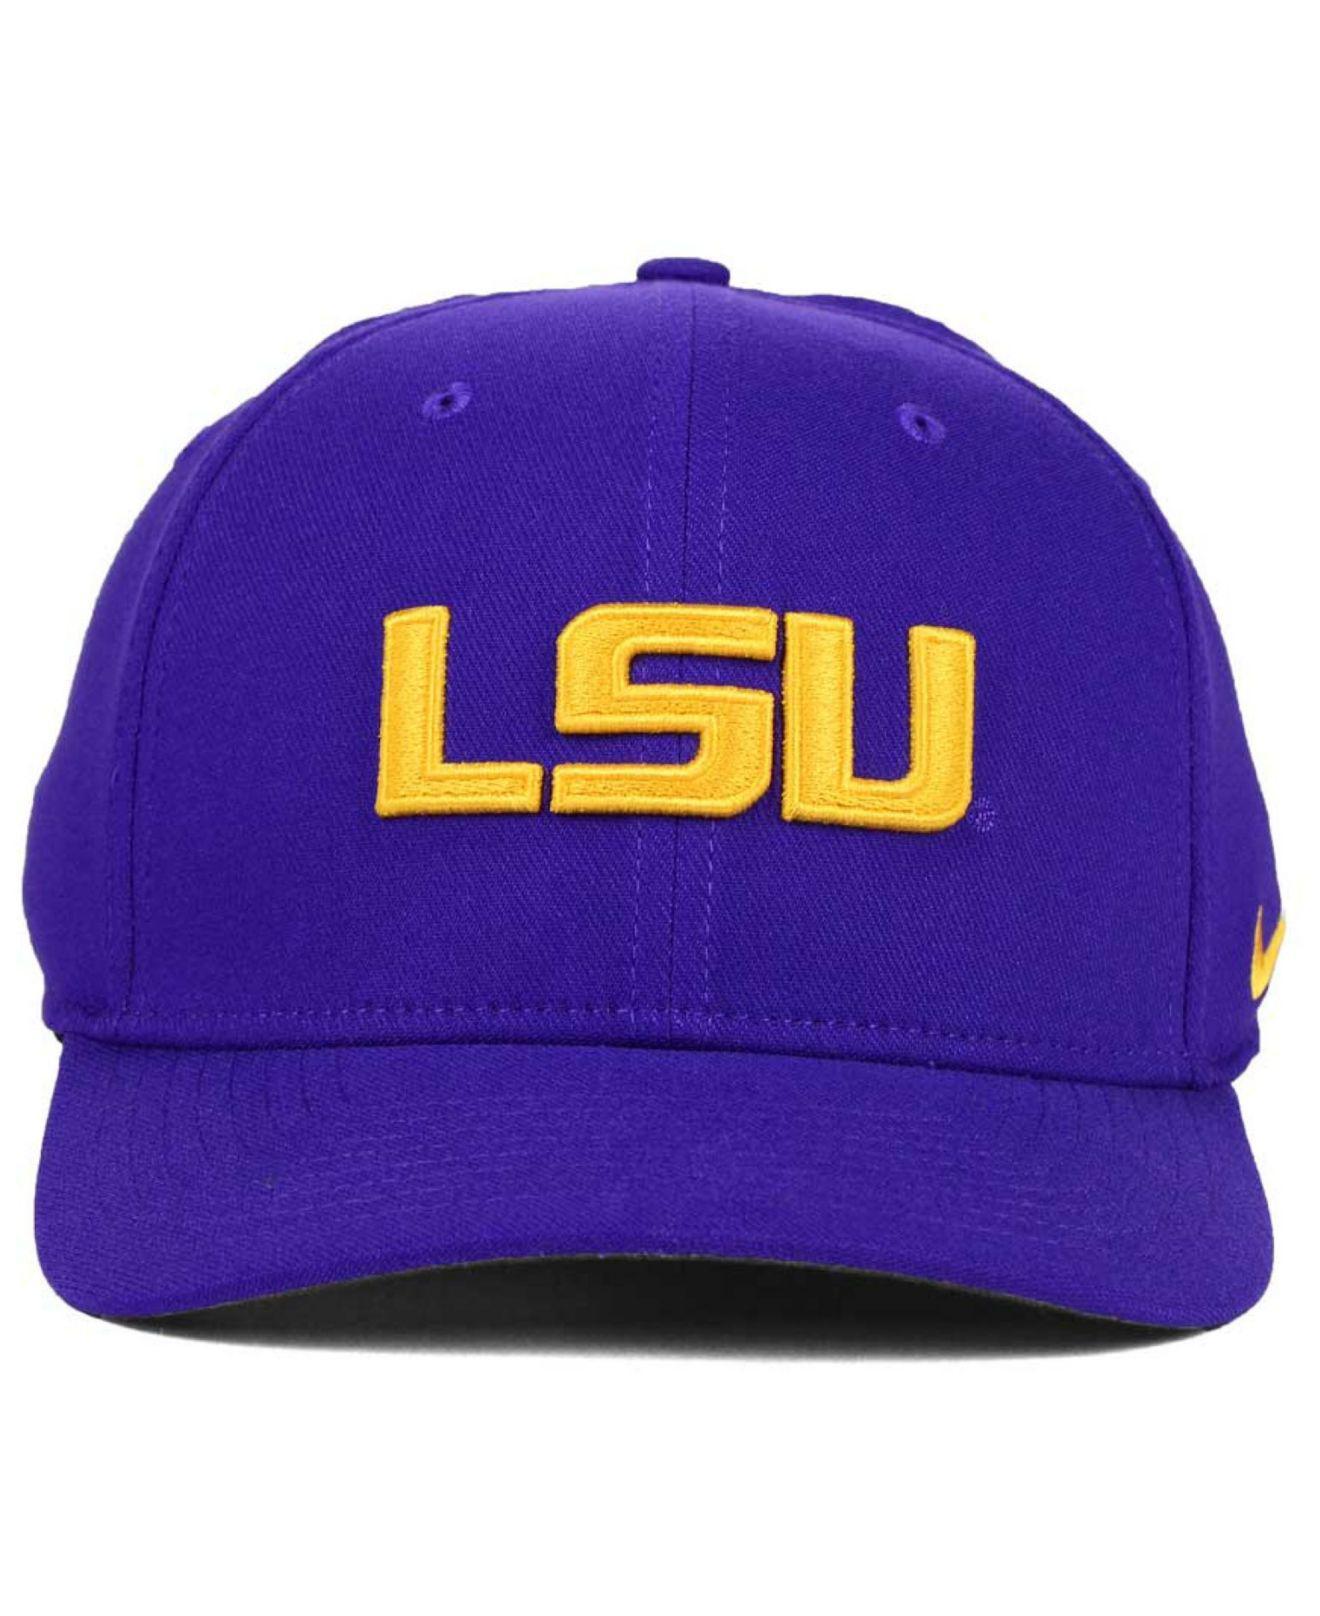 outlet store b5b7a 19ce8 ... cheap lyst nike lsu tigers classic swoosh cap in purple for men 75c3f  acc55